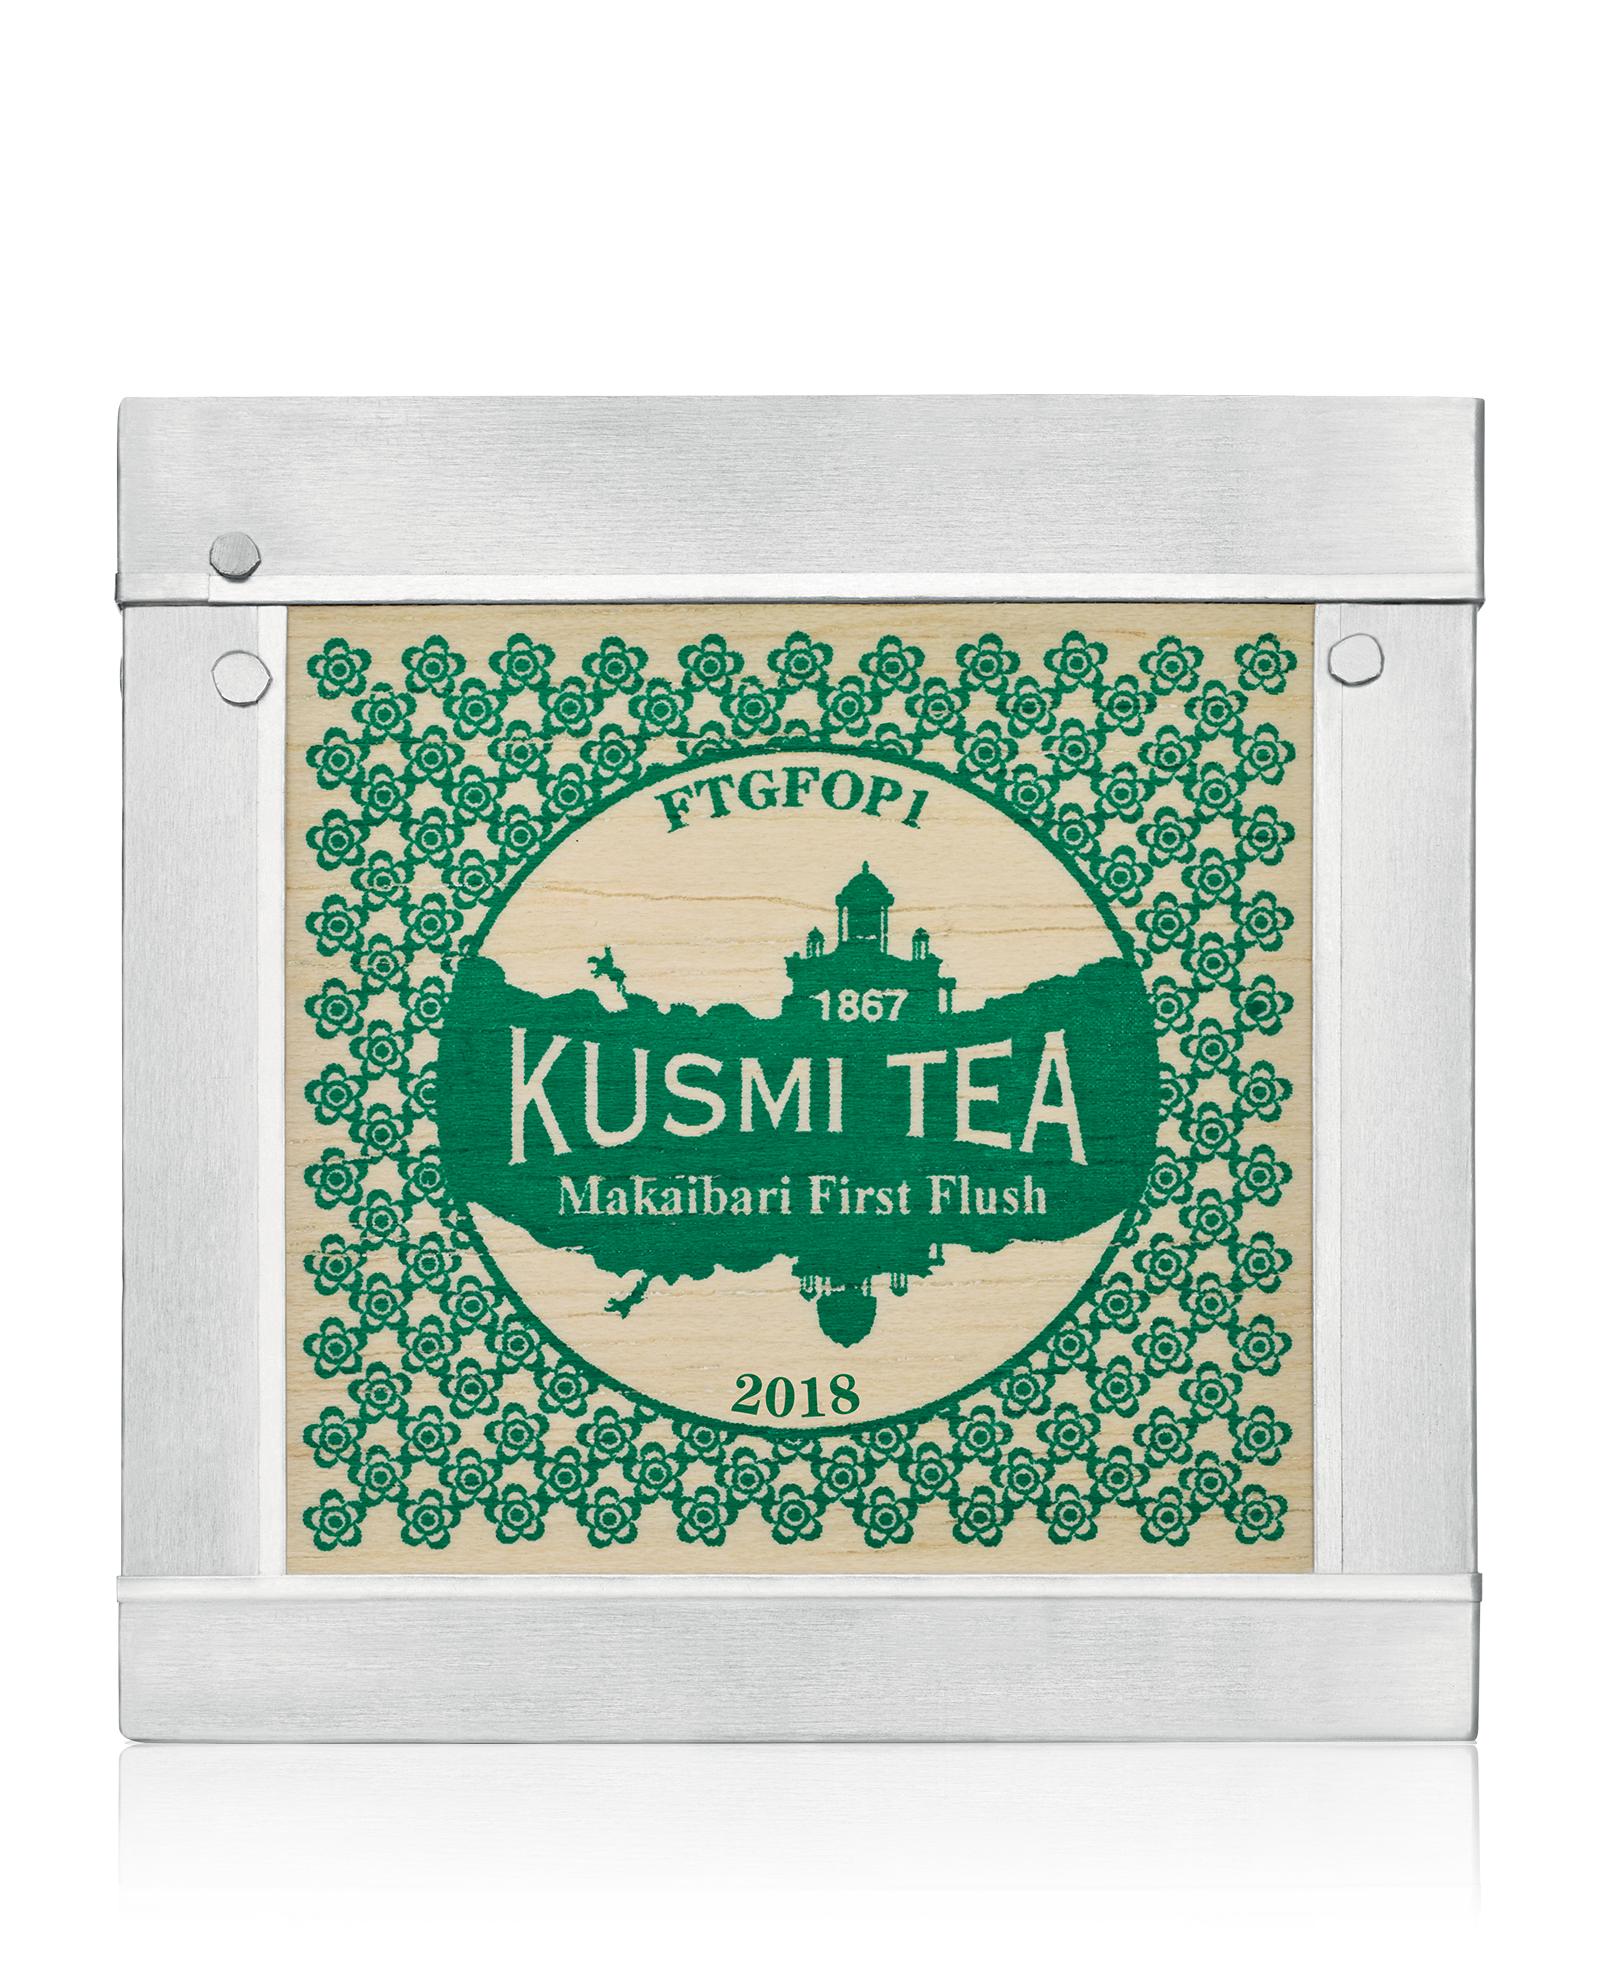 KUSMI TEA Makaibari Darjeeling First Flush 2018 Kusmi Tea